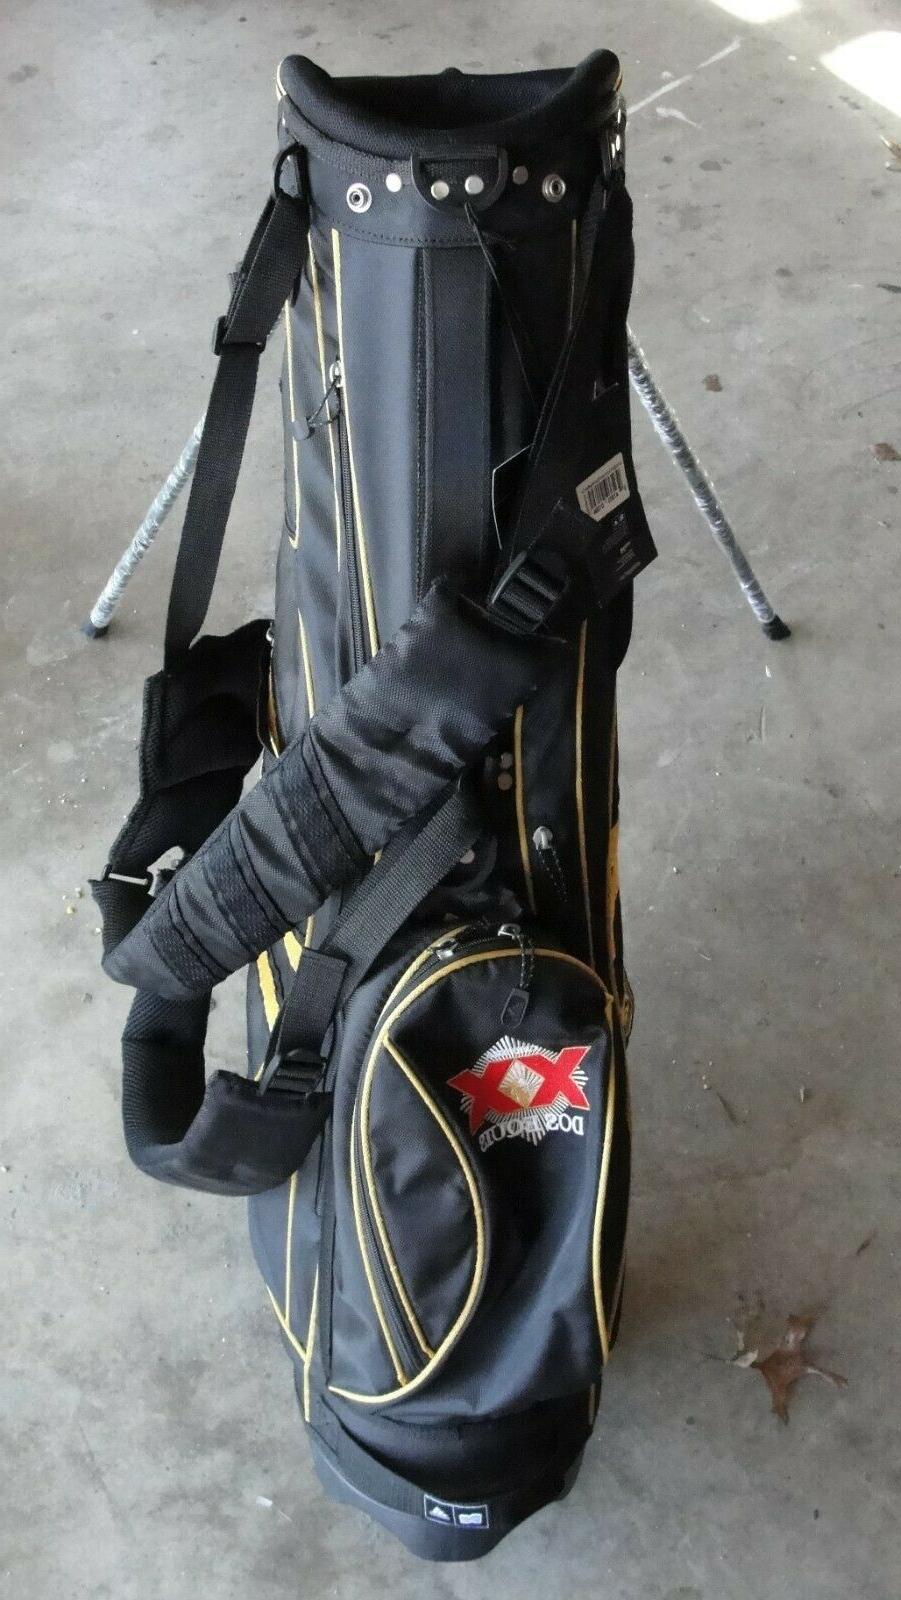 NEW Ascend Black Tan 6-Way Strap Stand Golf Bag